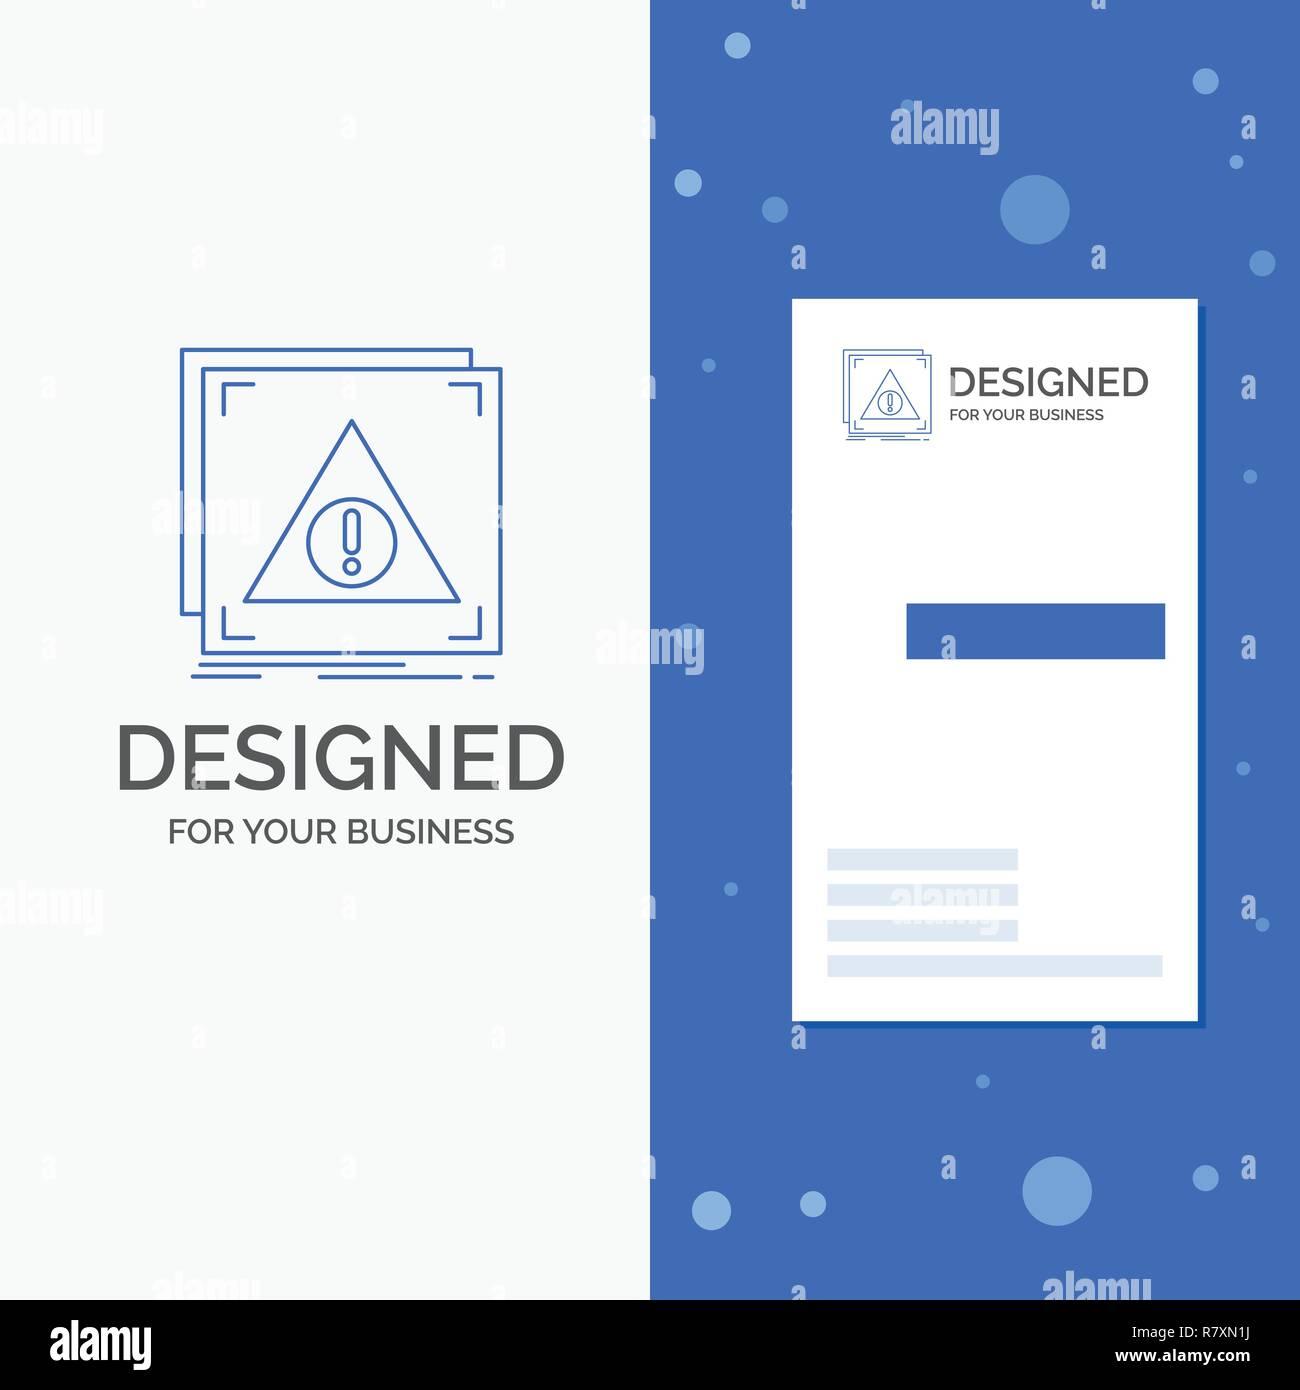 Business Logo for Error, Application, Denied, server, alert. Vertical Blue Business / Visiting Card template - Stock Image